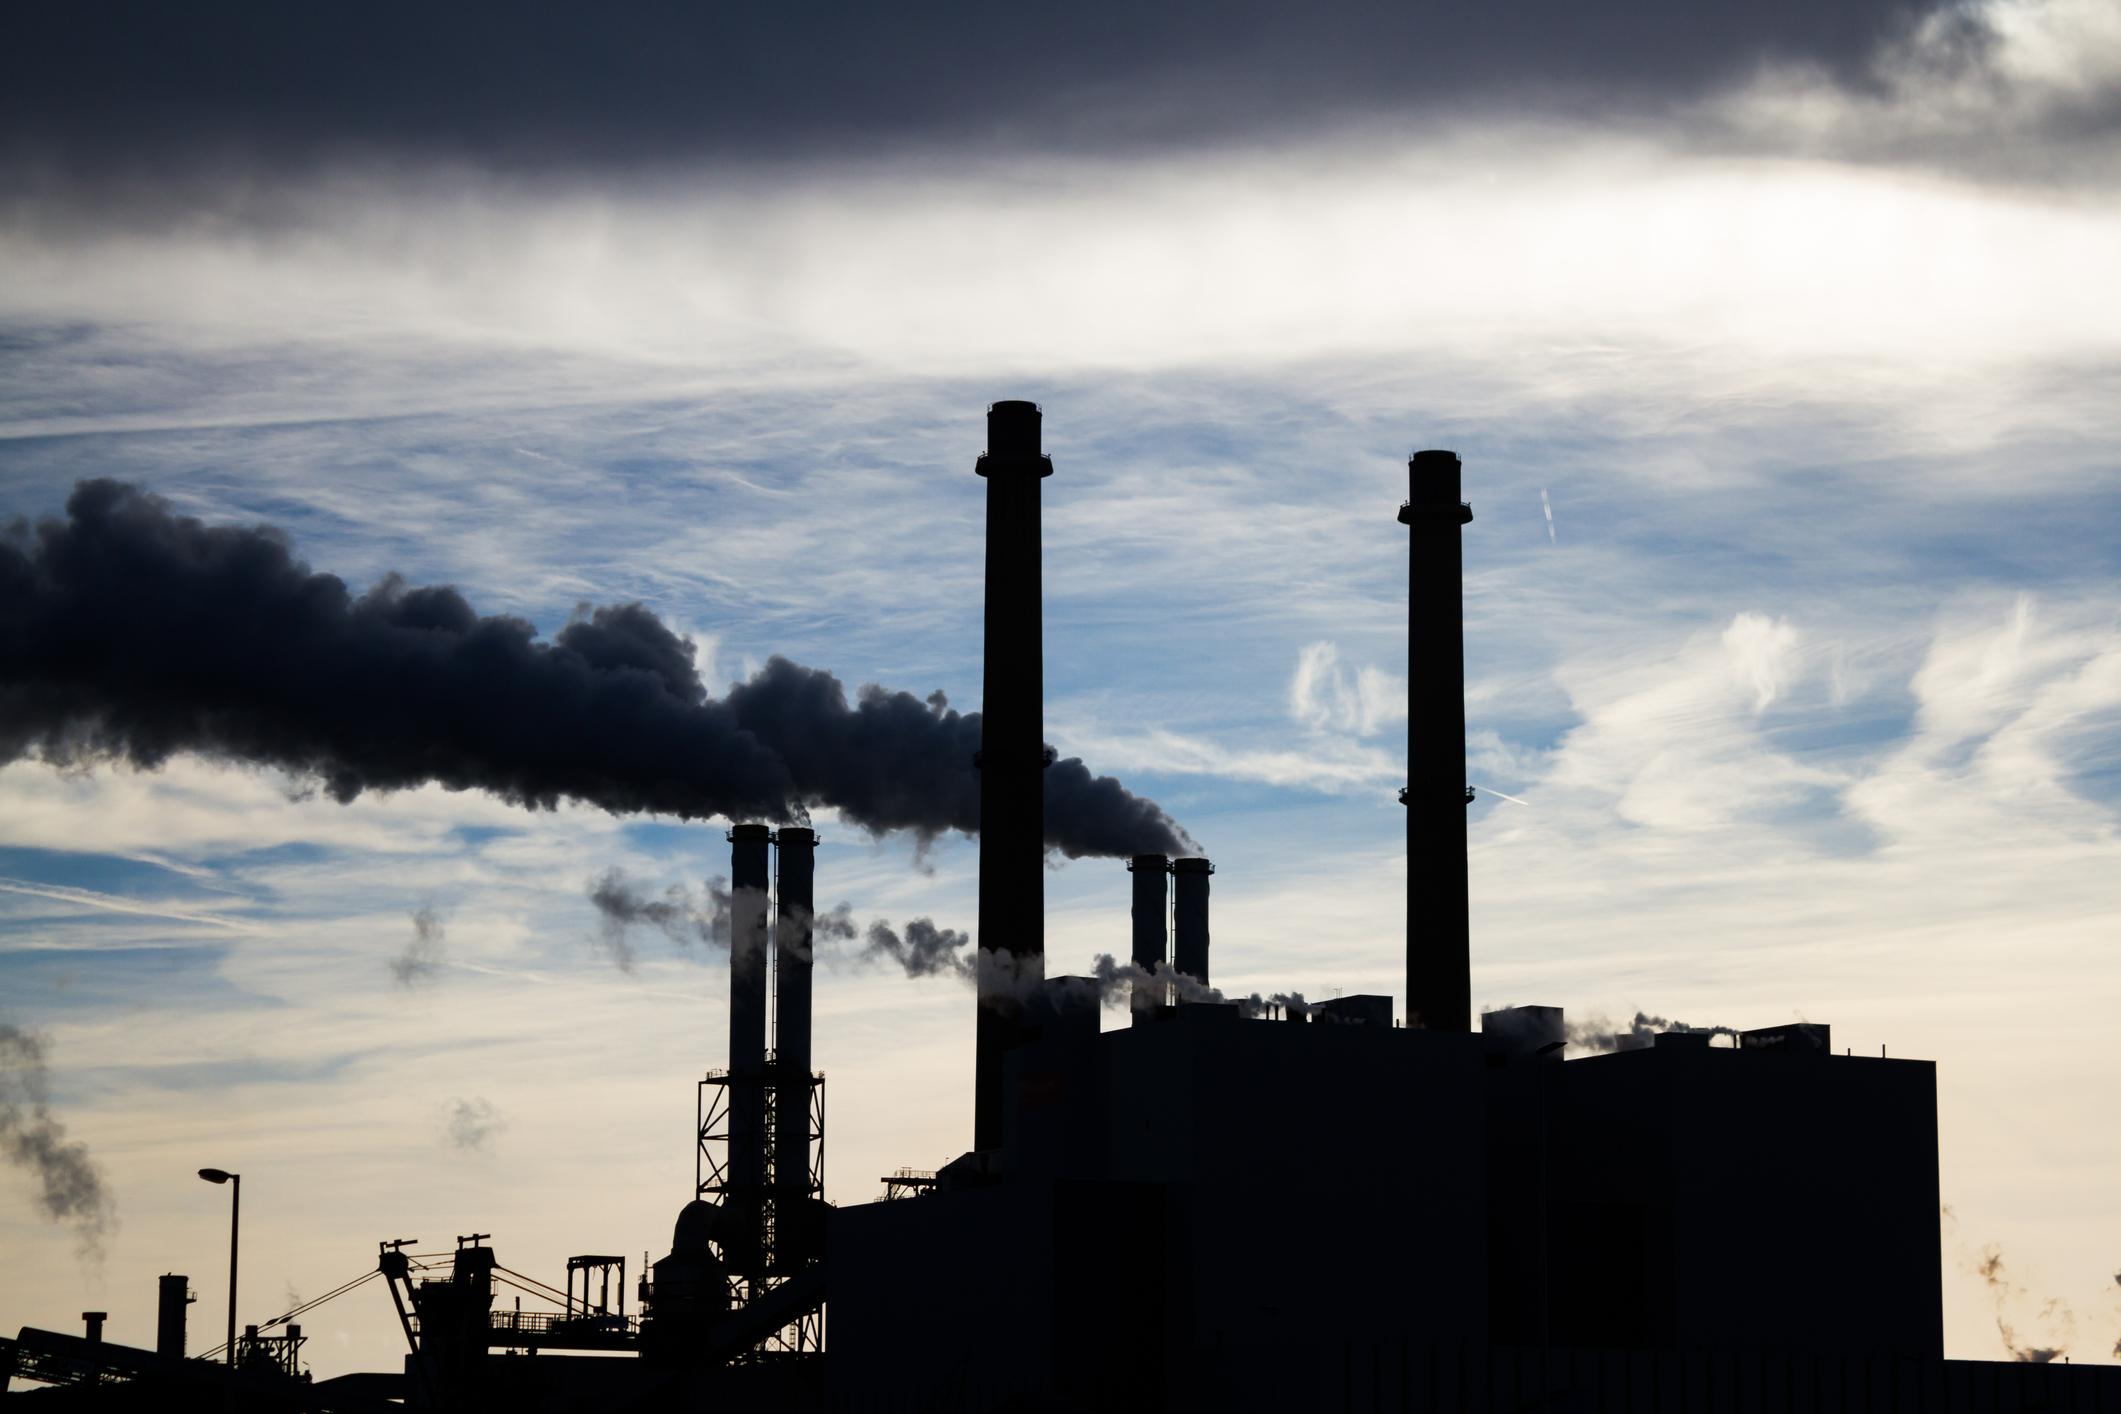 Theme #2: Anti-fossil fuel politics and governance -